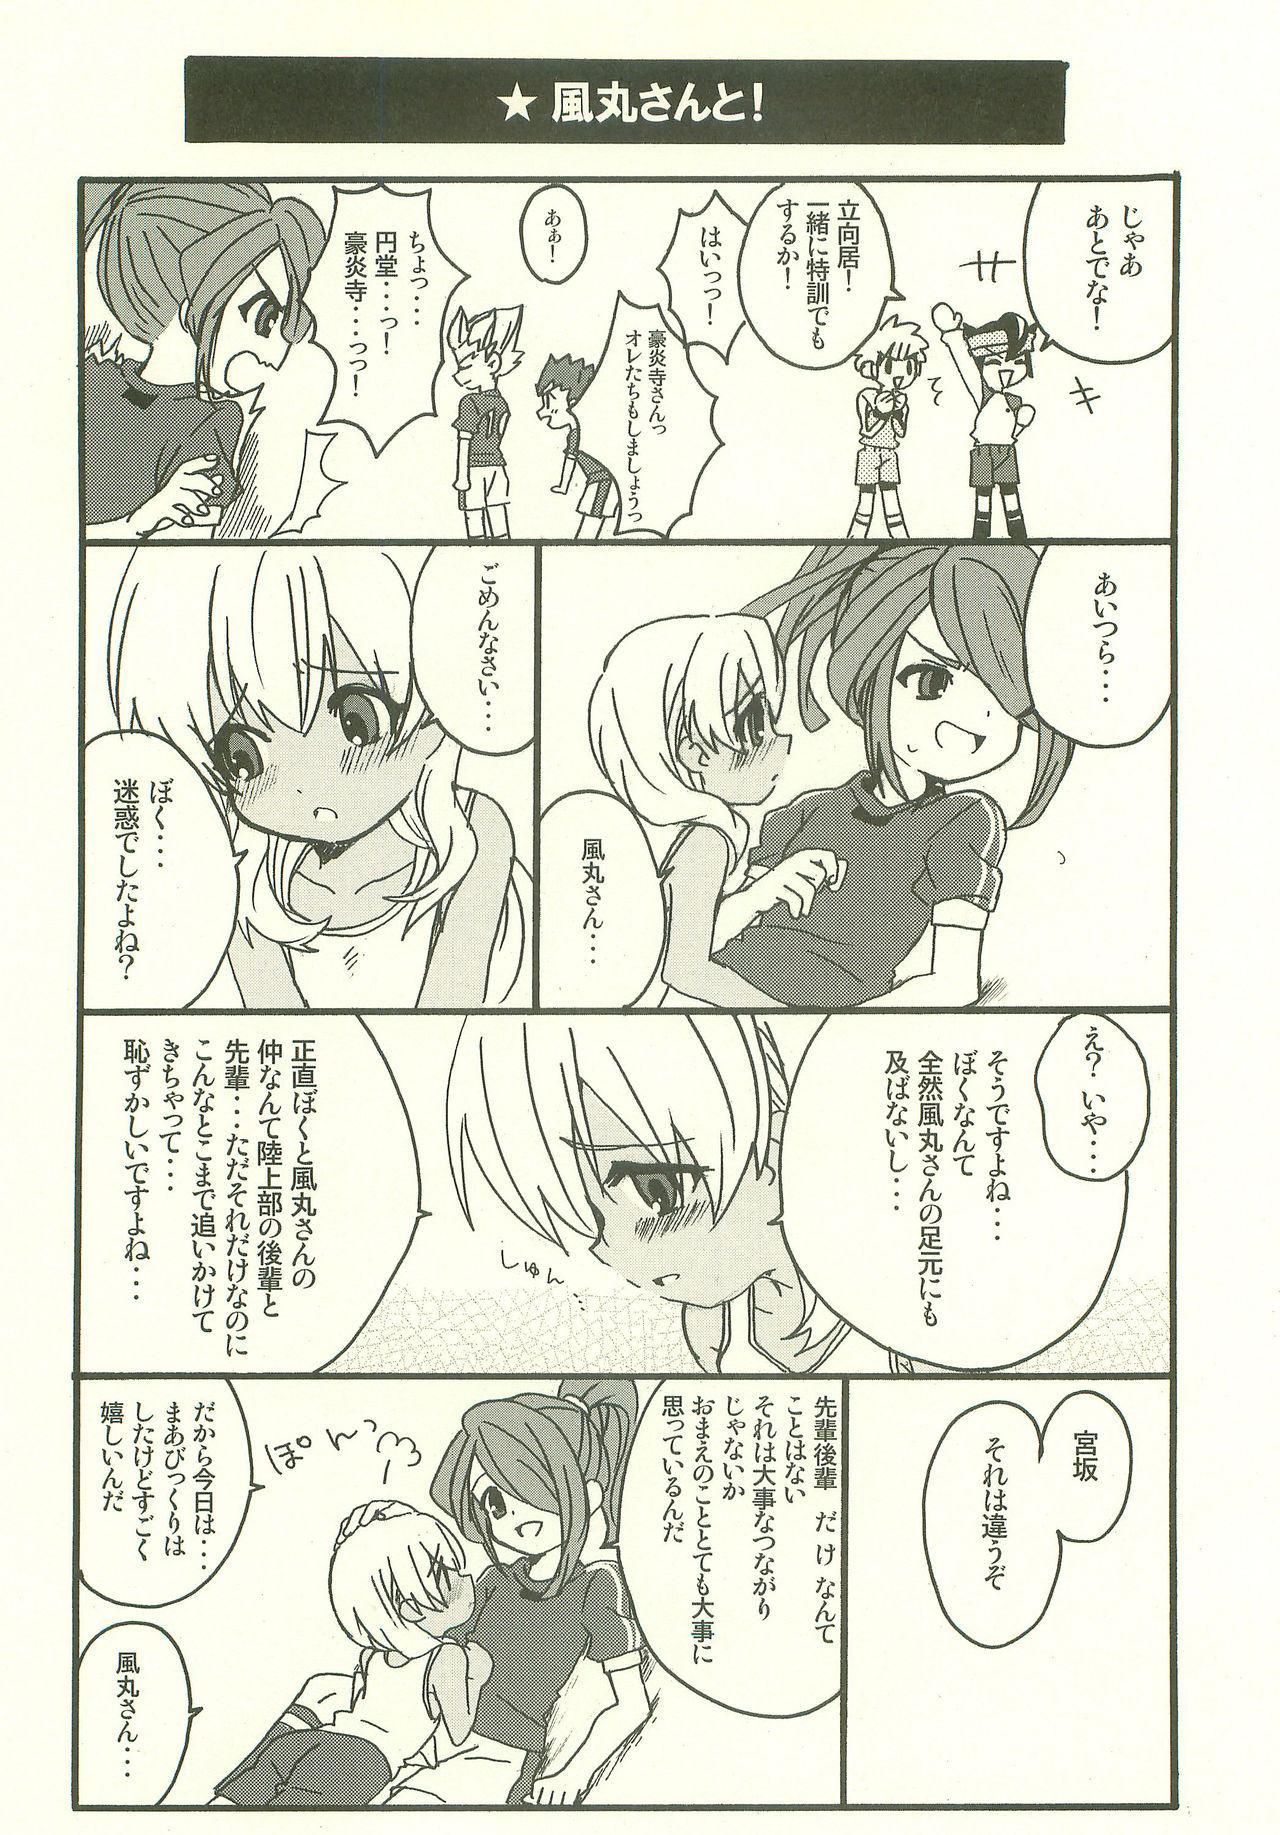 Datte, Daisuki! 6